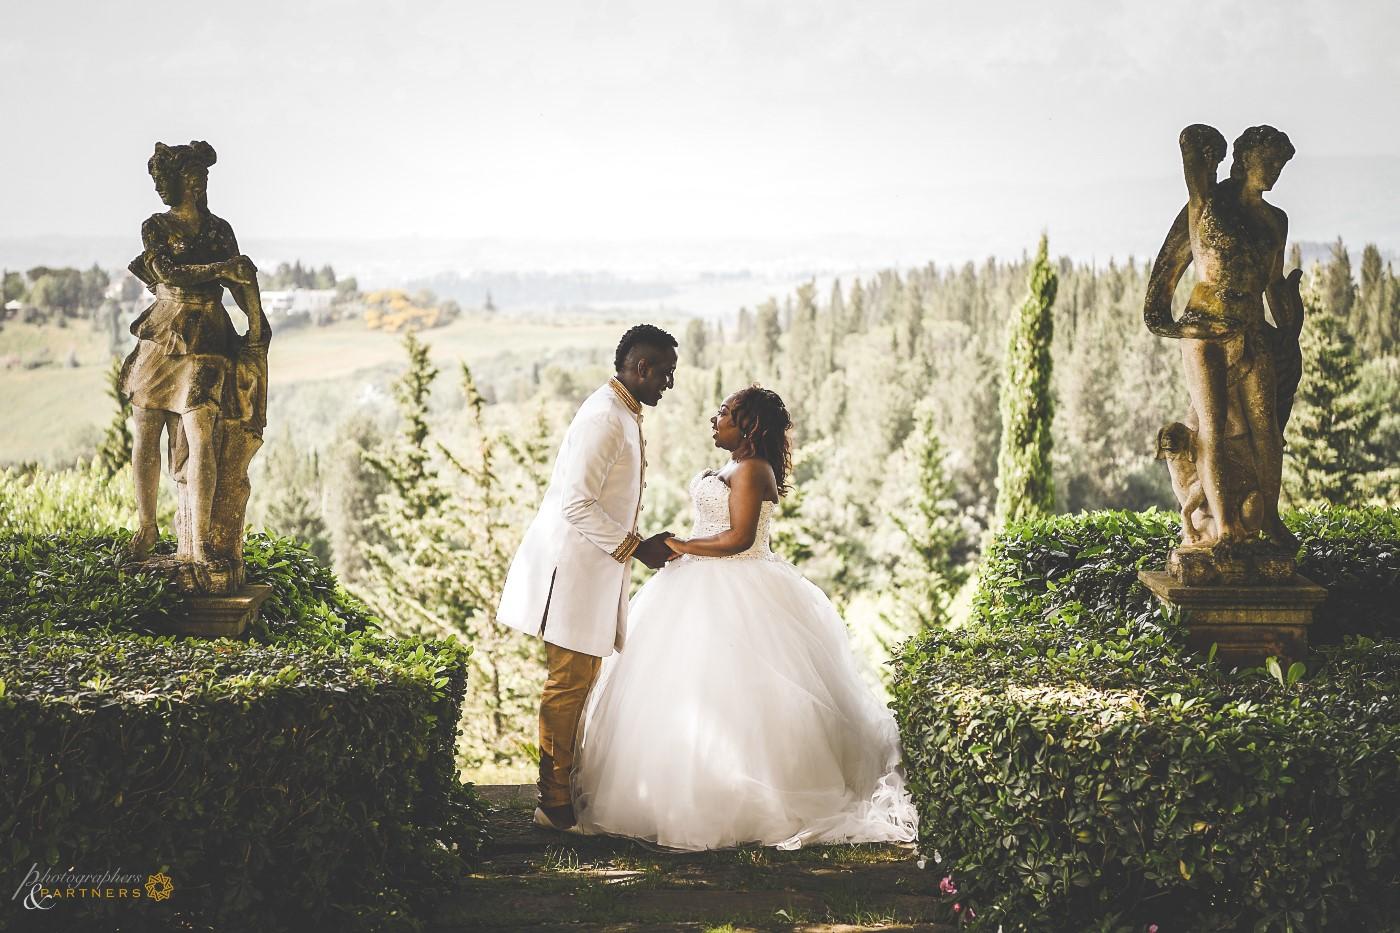 wedding_photograpers_in_tuscany_15.jpg